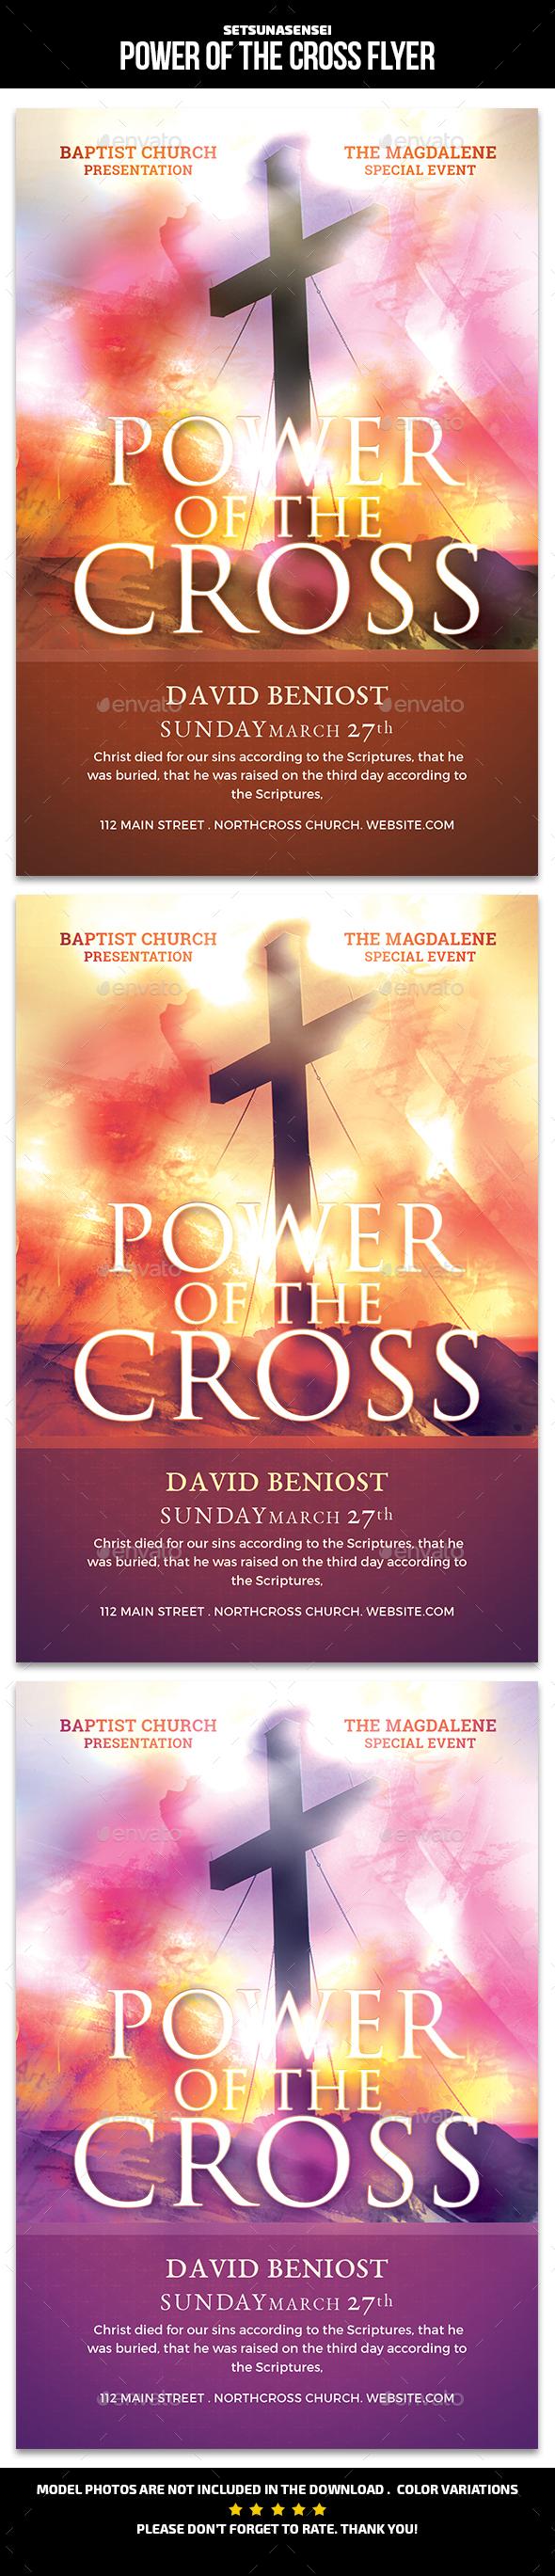 Power of the Cross Flyer - Church Flyers